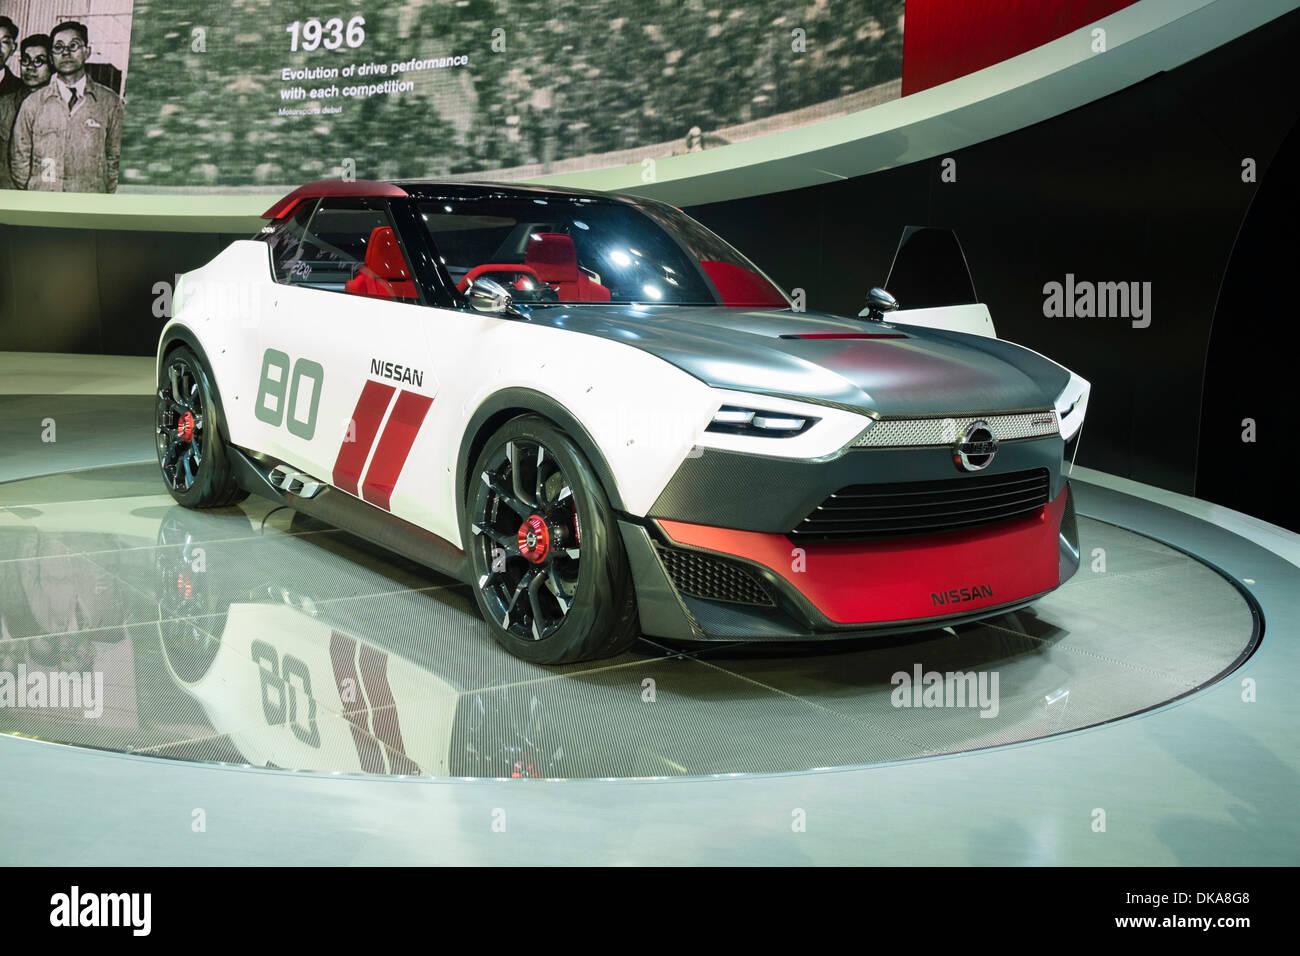 Nissan IDx Freeflow concept car at Tokyo Motor Show 2013 in Japan - Stock Image